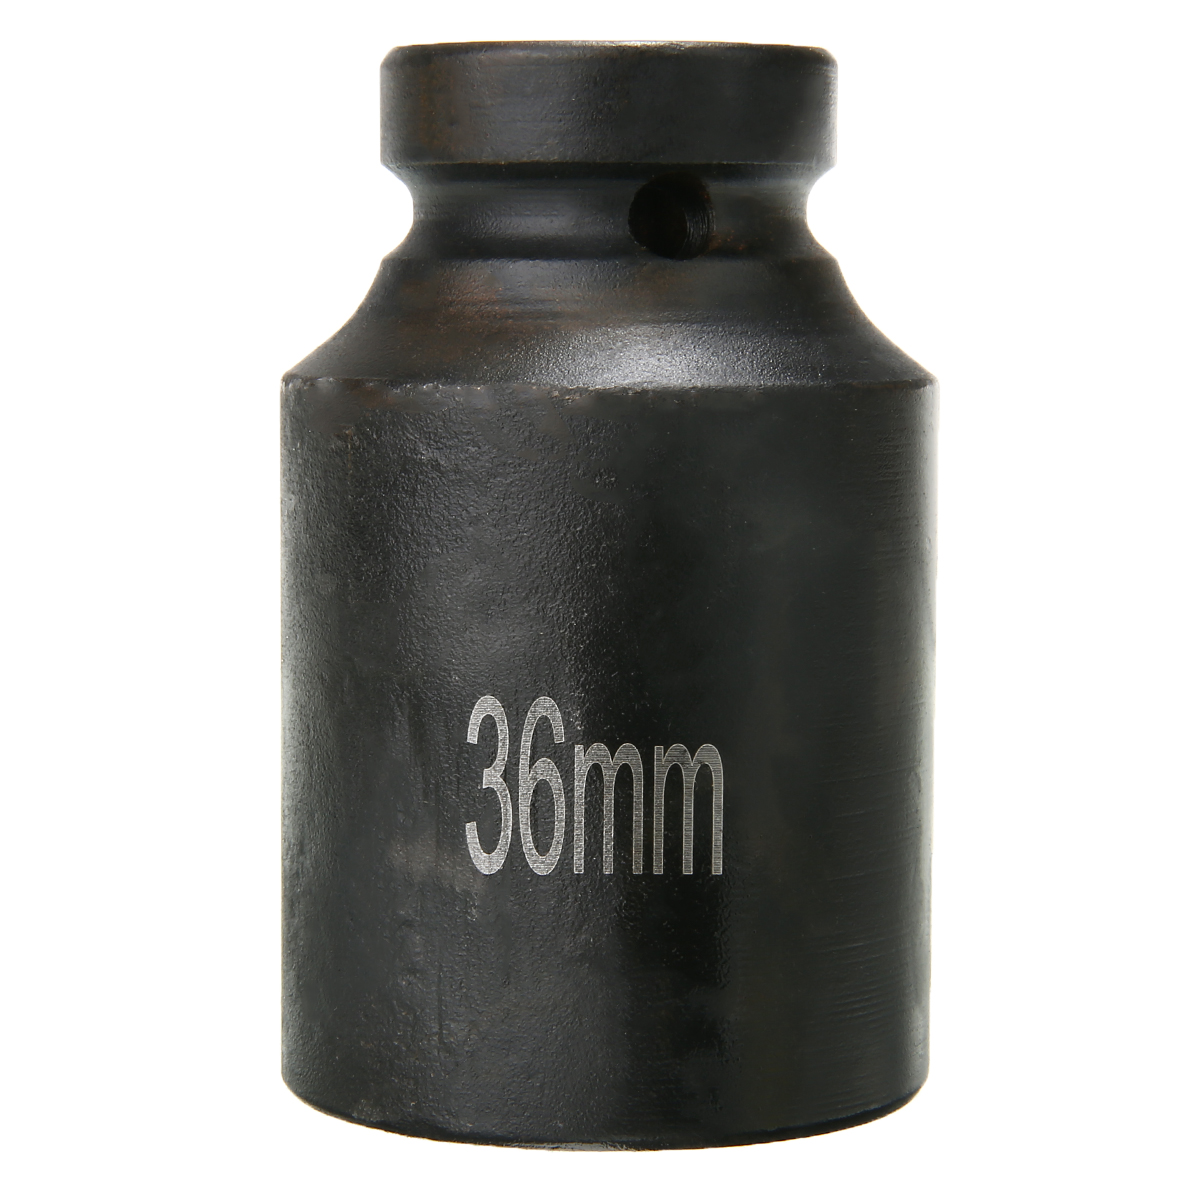 36mm 1/2